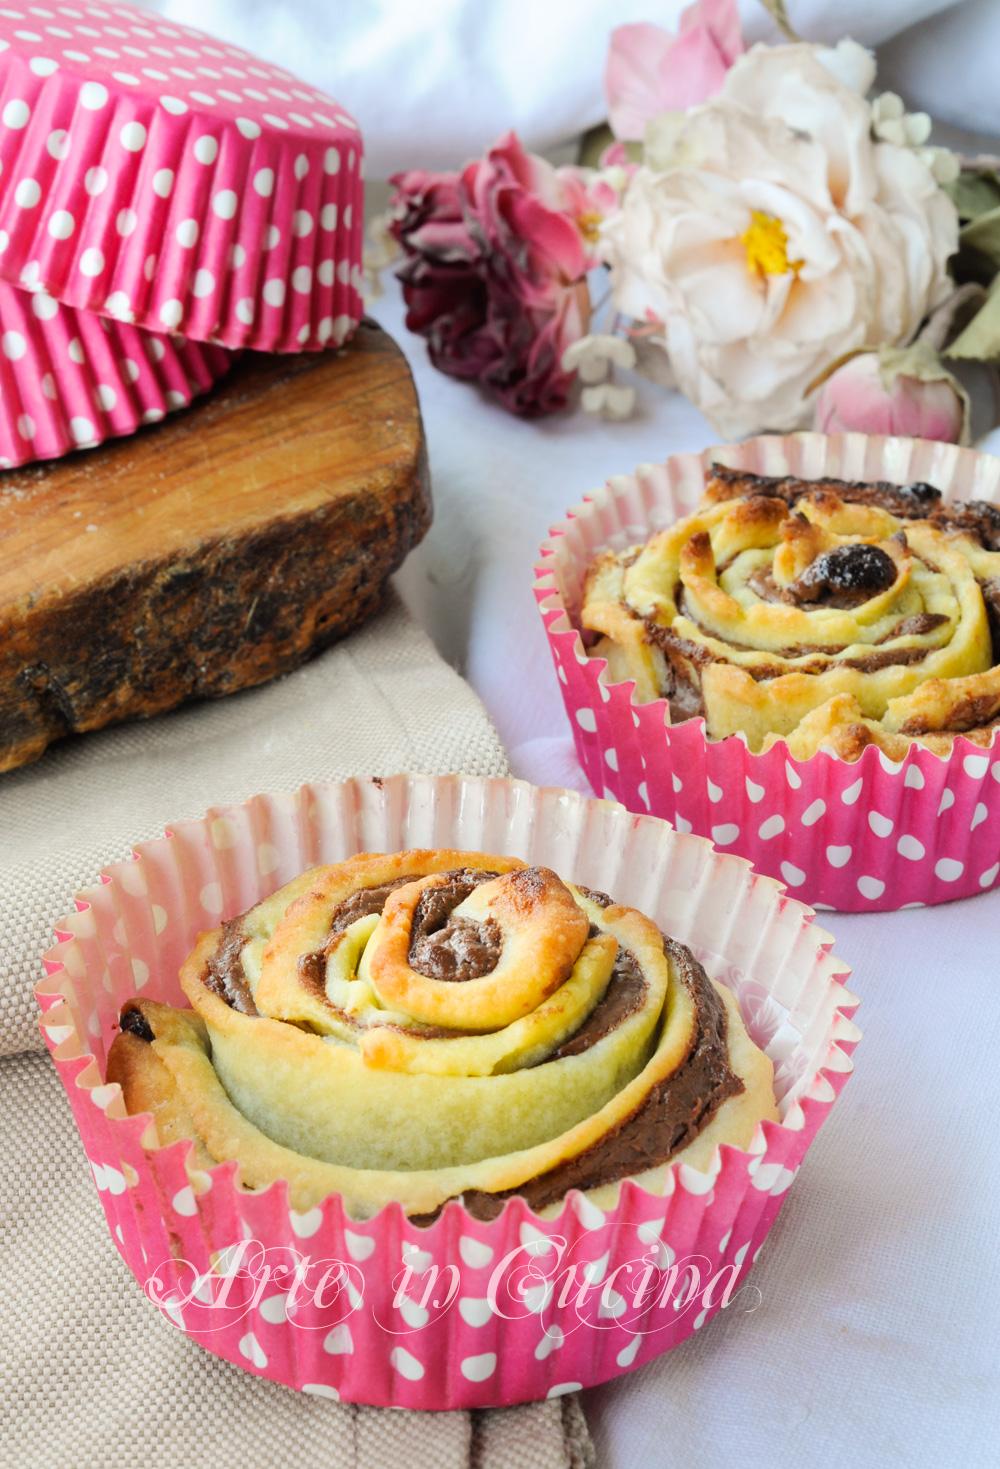 Rose di frolla alla nutella ricetta dolce facile arte in cucina - Cucina macrobiotica dolci ...